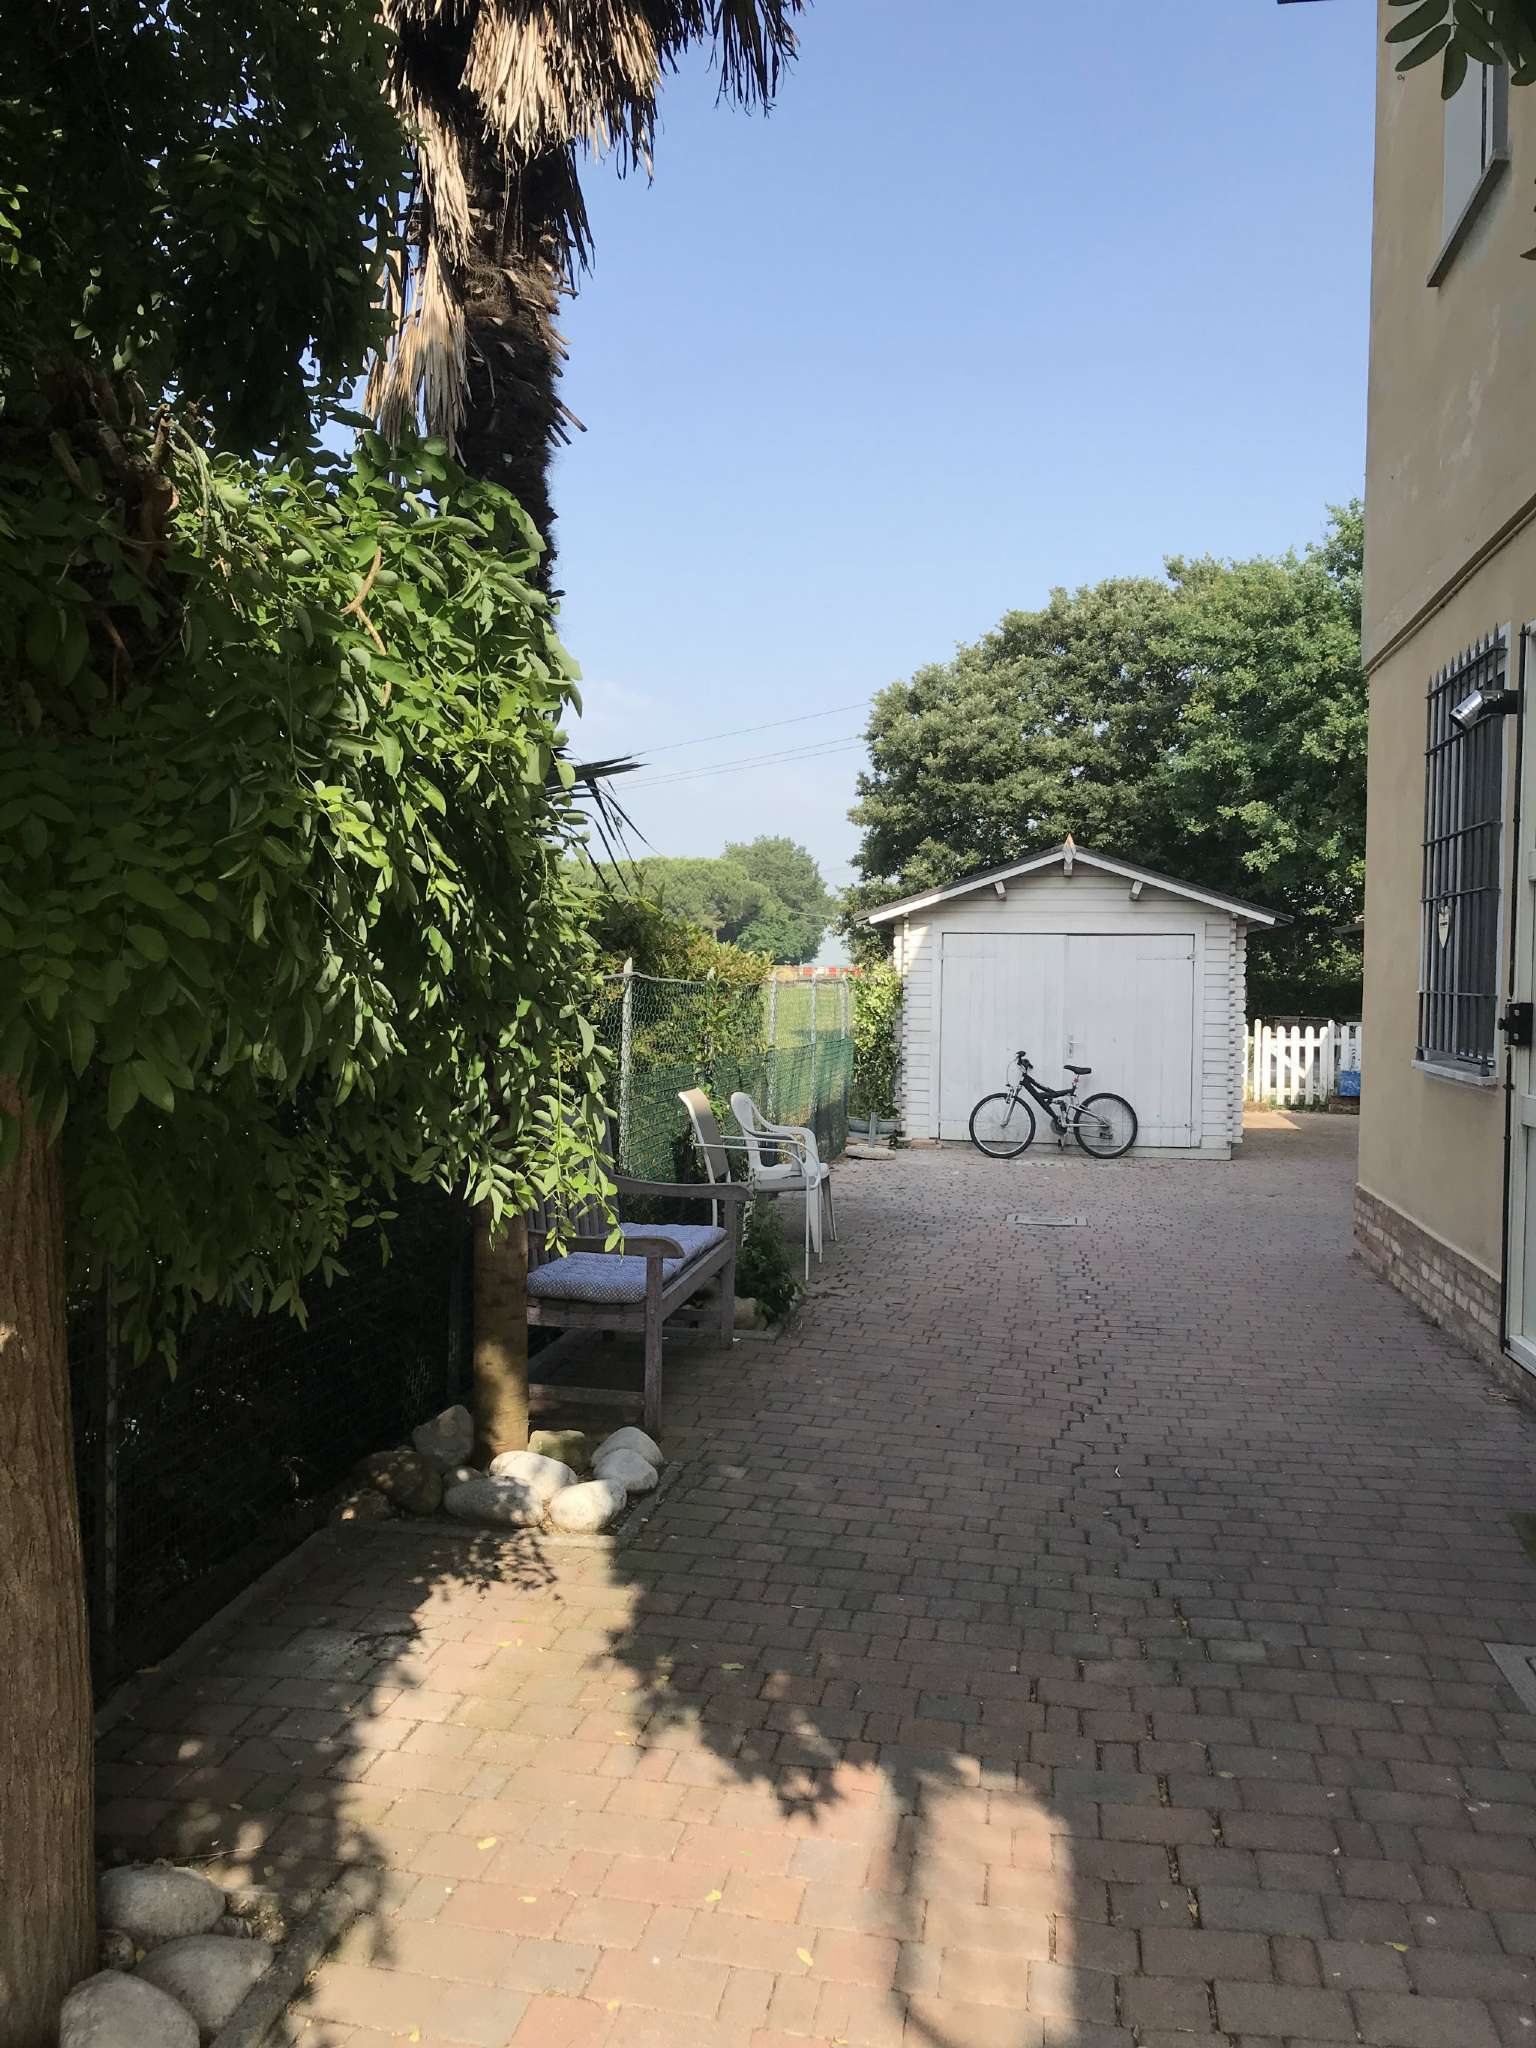 Casa indipendente in Vendita a Ravenna Periferia Nord: 5 locali, 154 mq